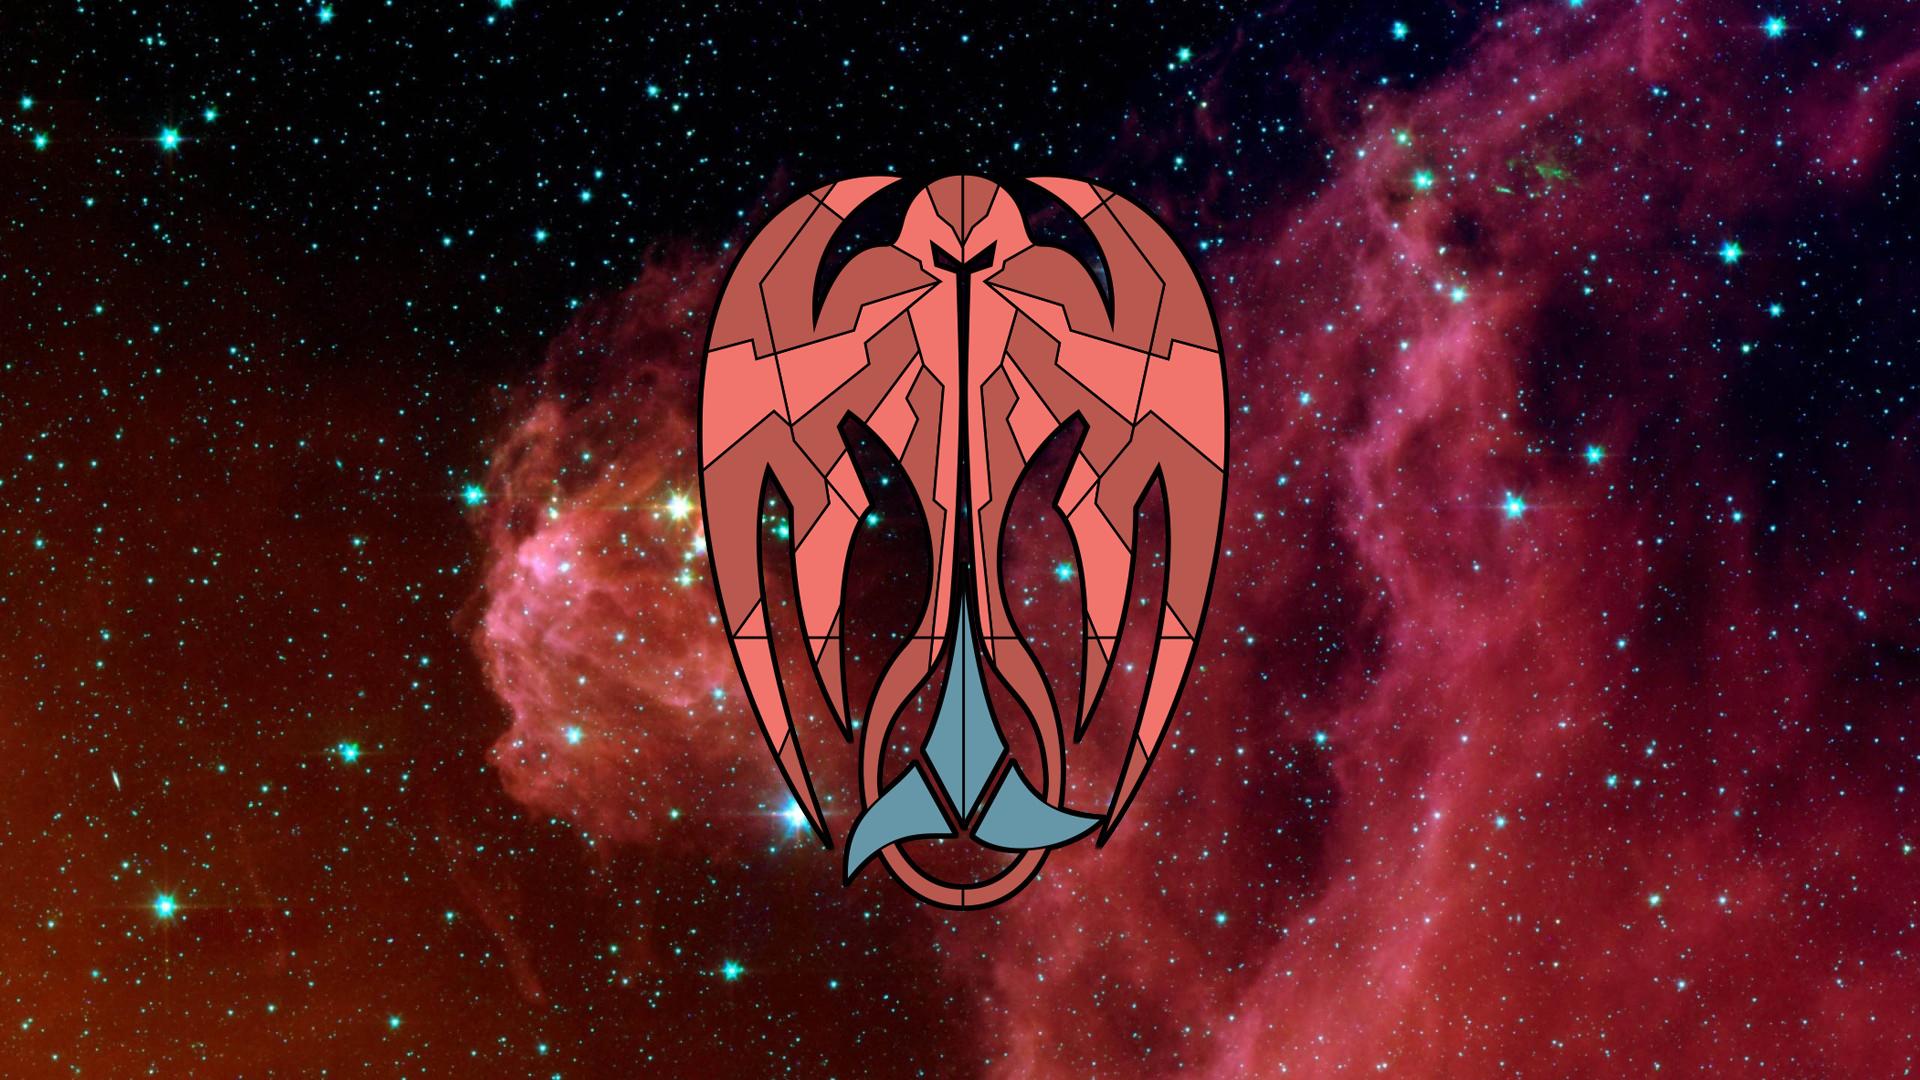 klingon_kardassziai_szovetseg.jpg